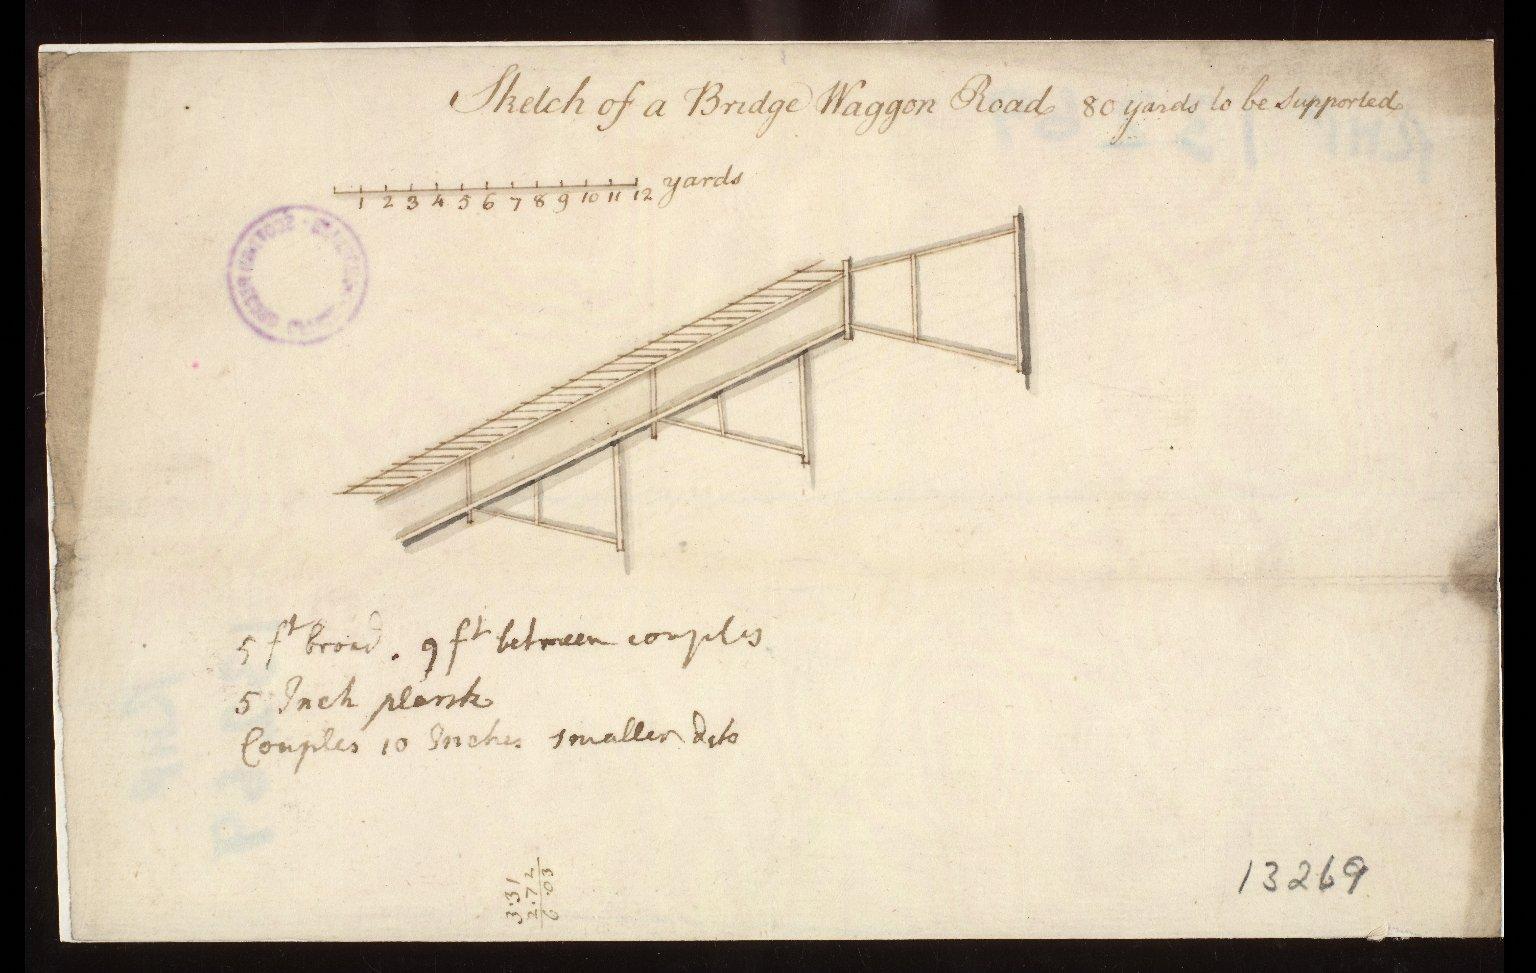 Sketch of a Bridge Waggon [i.e. wagon] Road. [1 of 1]